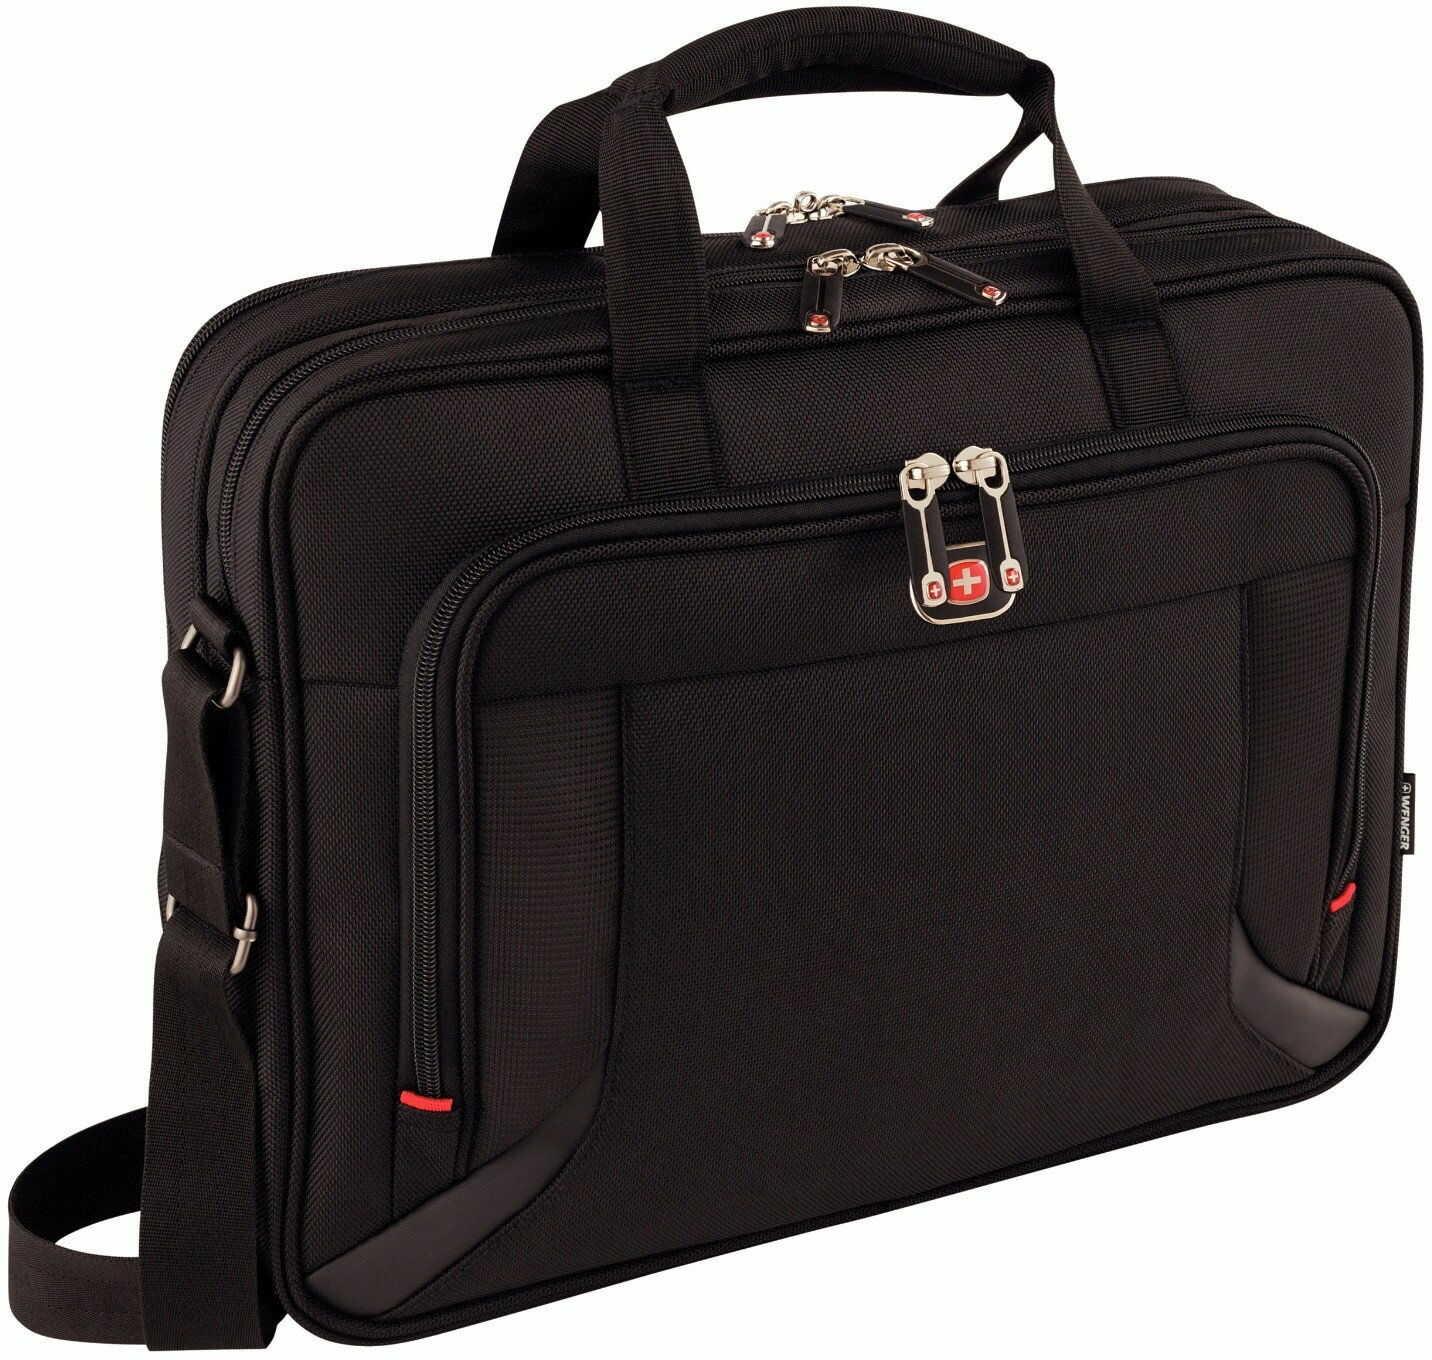 "Torba na laptopa WENGER PROSPECTUS 16"" czarna /WE600649/"